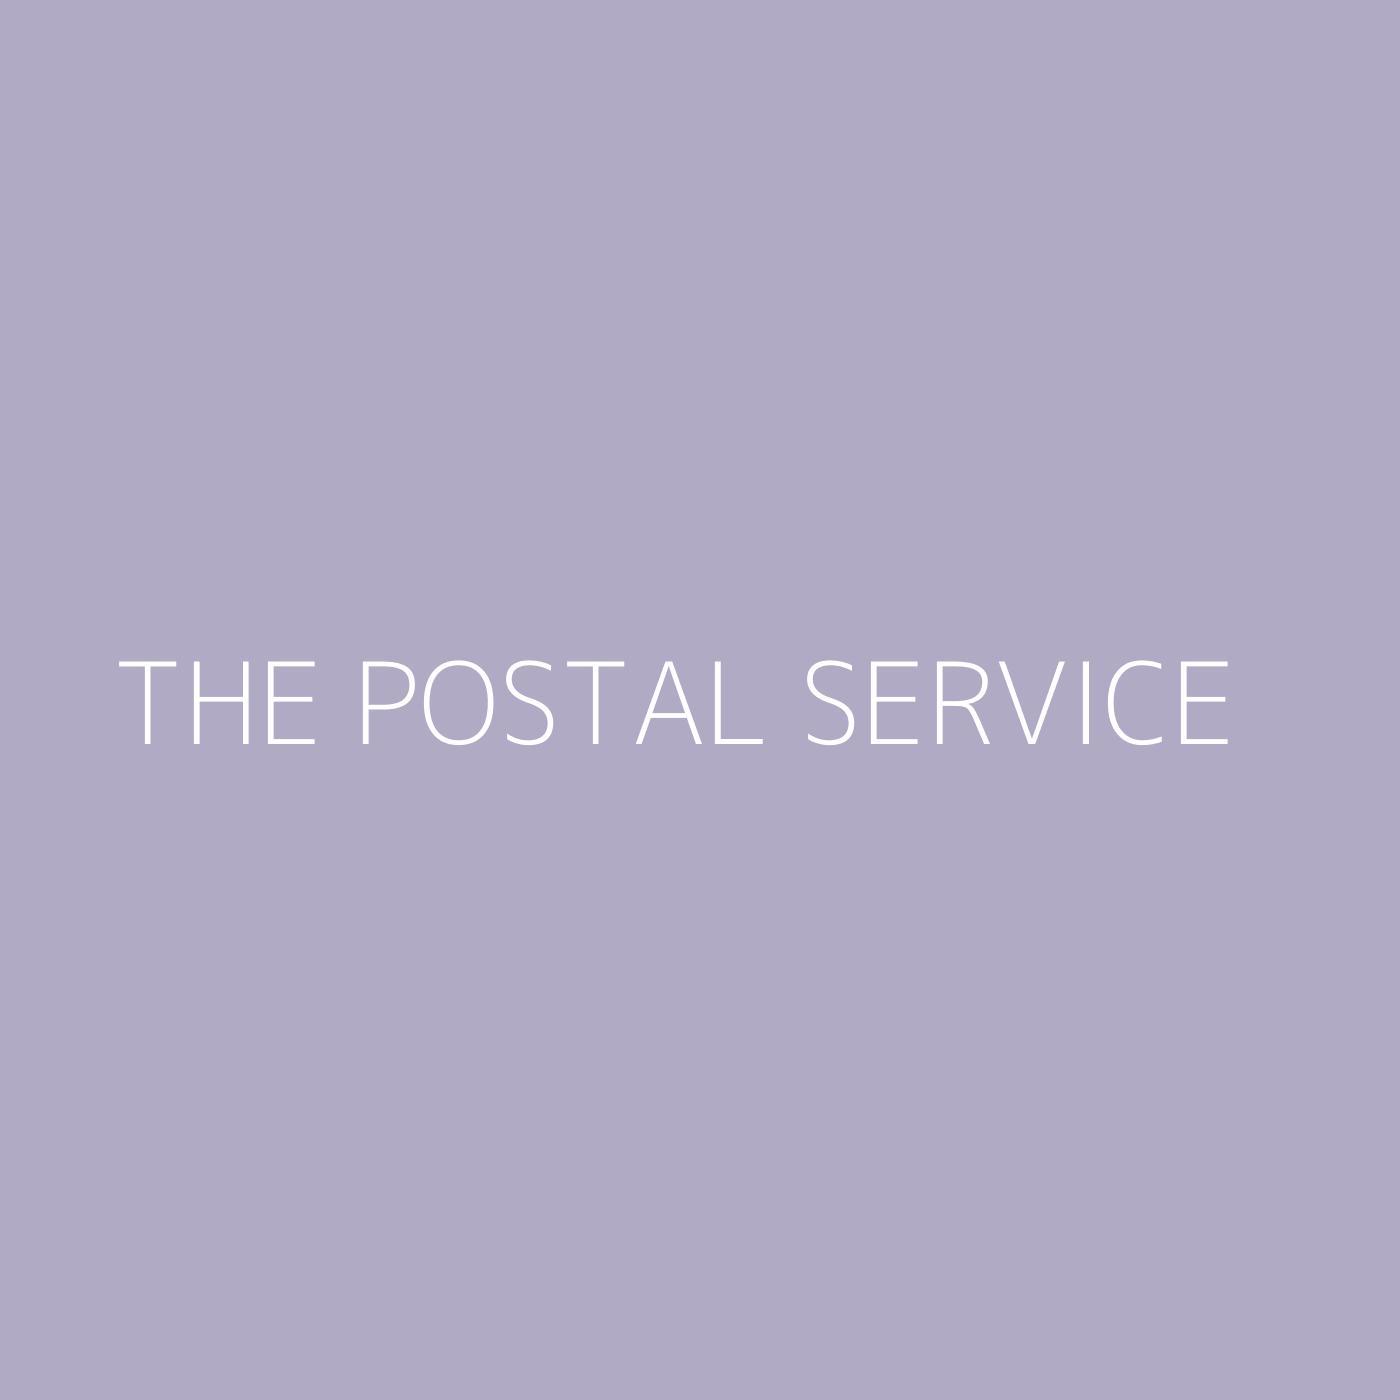 The Postal Service Playlist Artwork